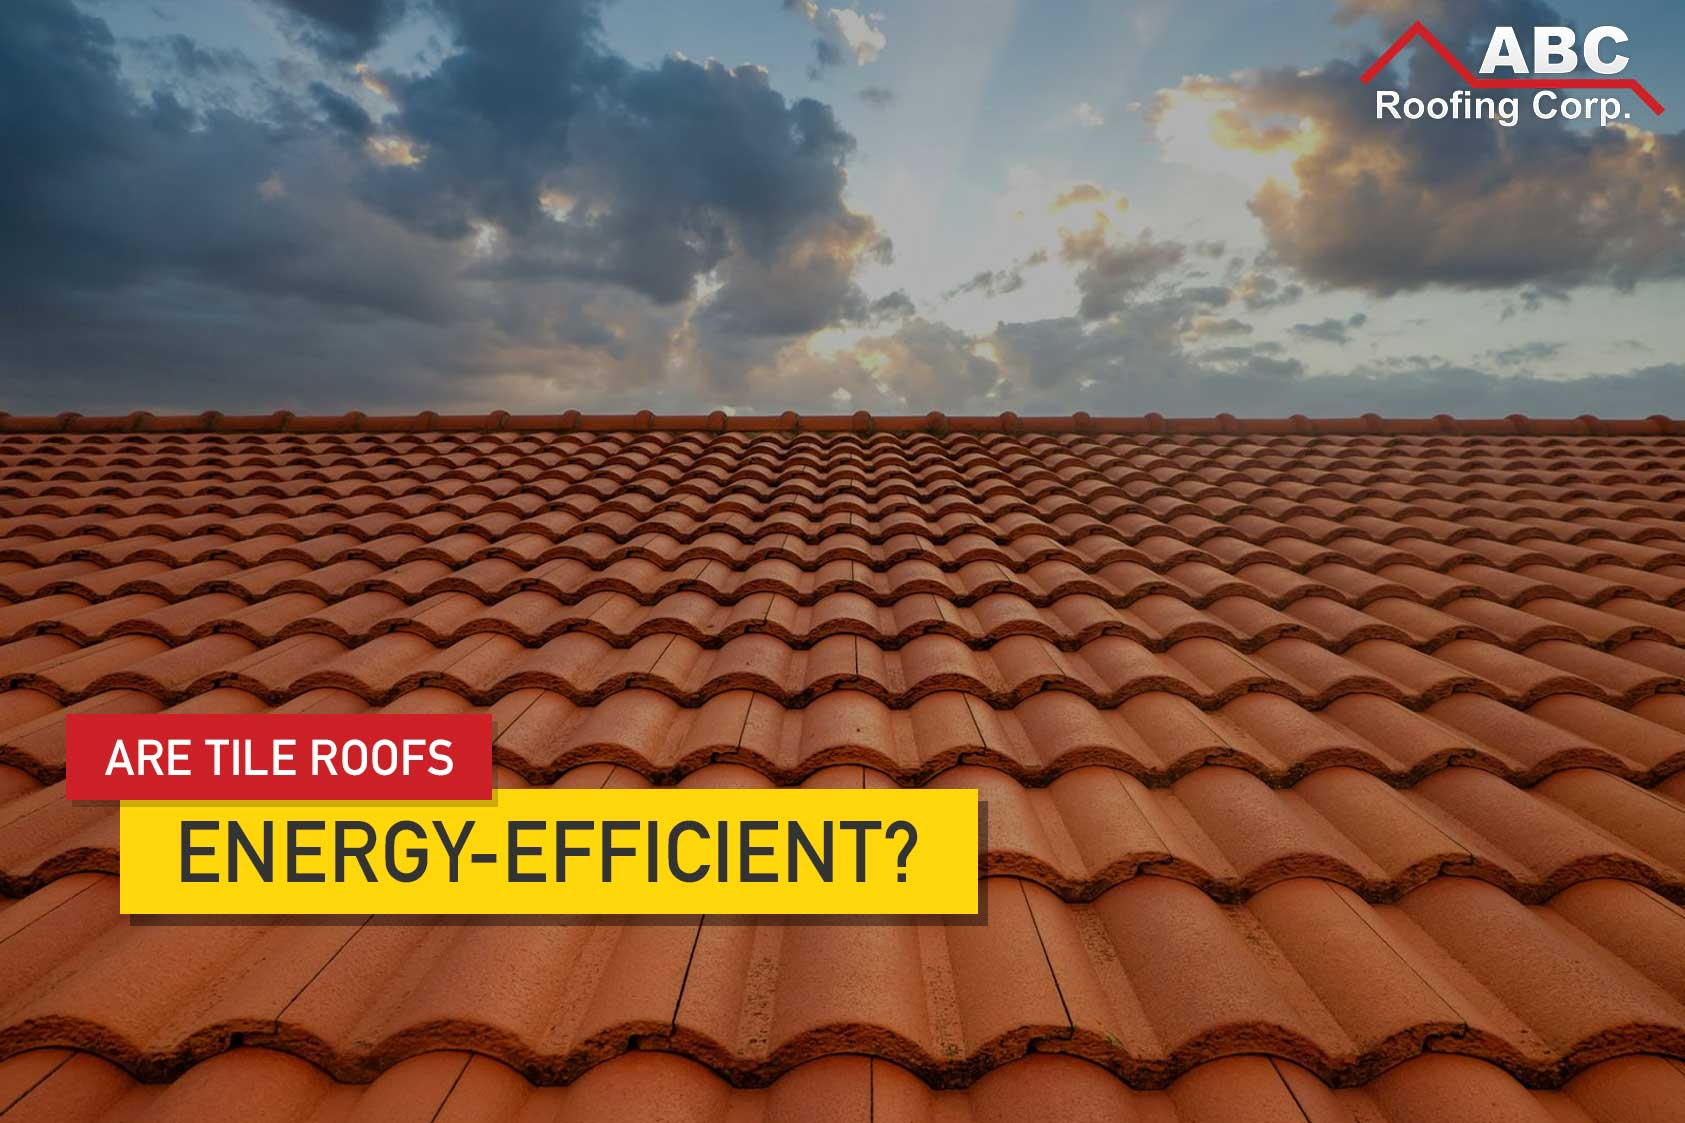 Tile Roofs Energy-Efficient